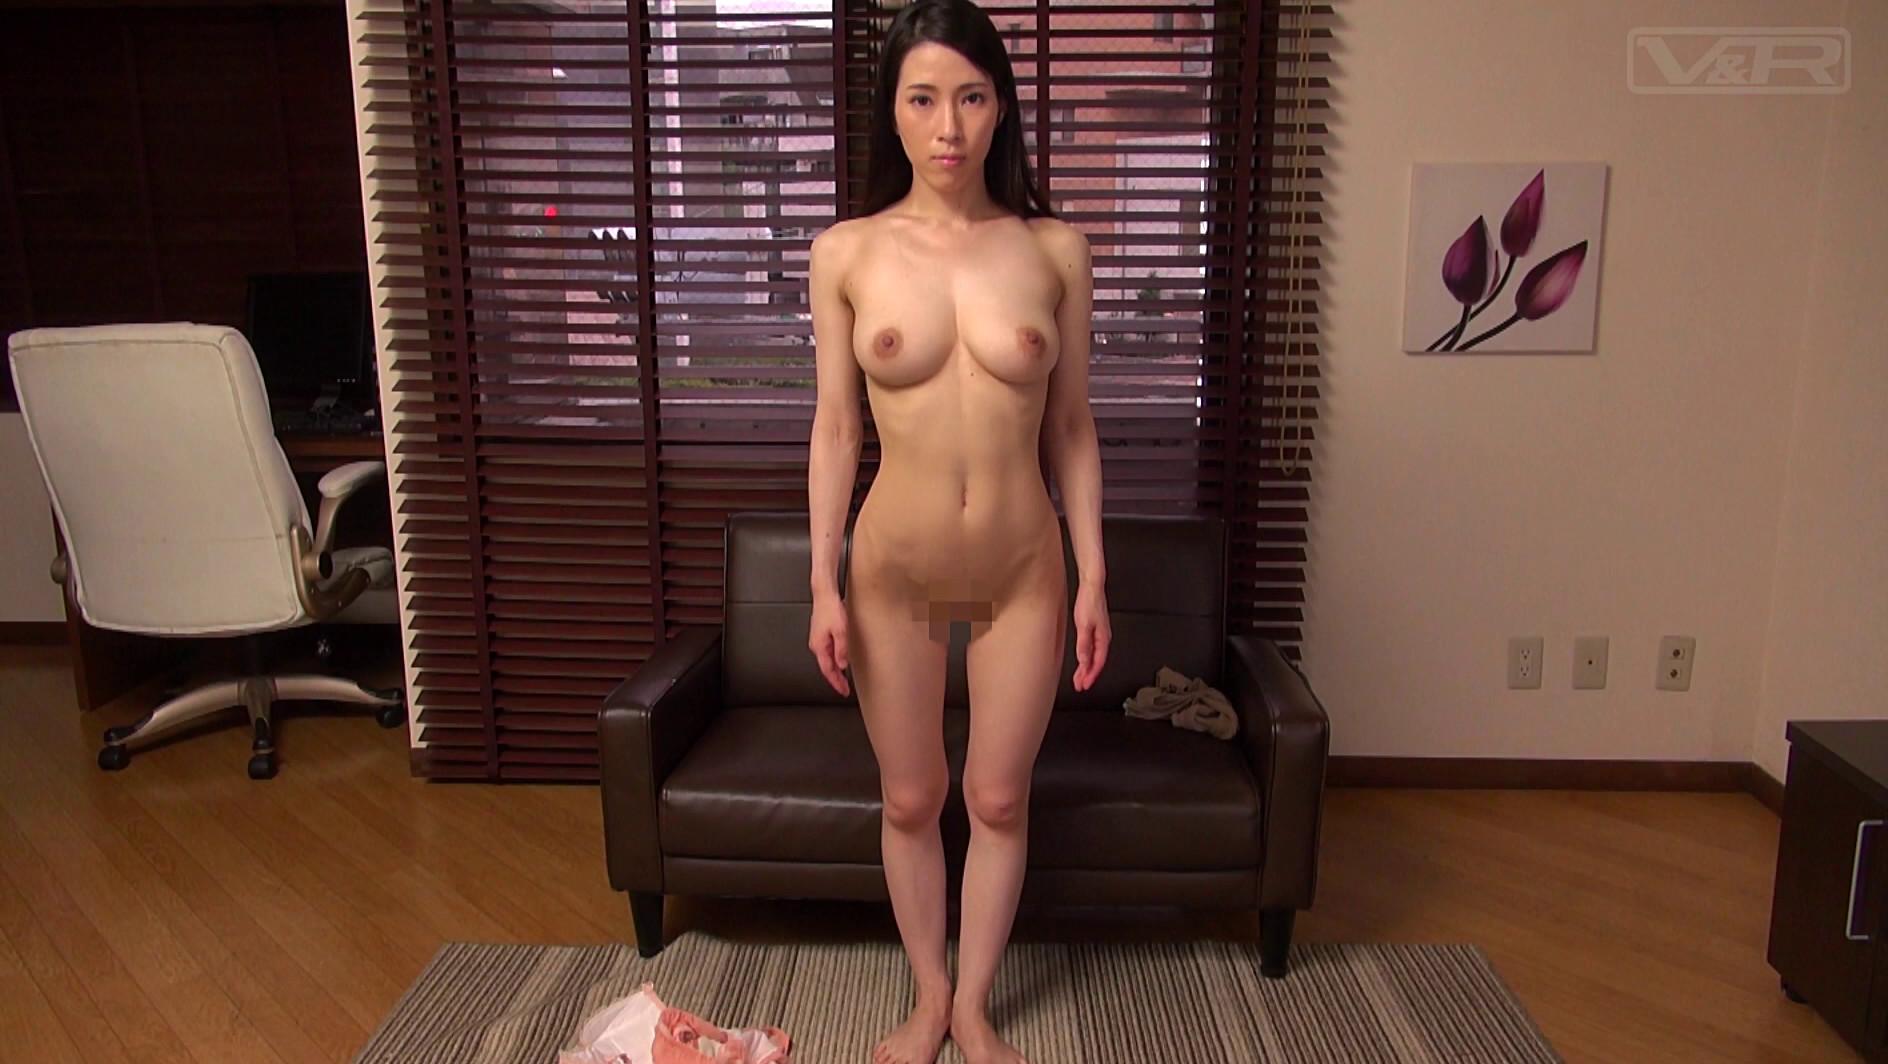 Nana visitor nude pics pics, sex tape ancensored